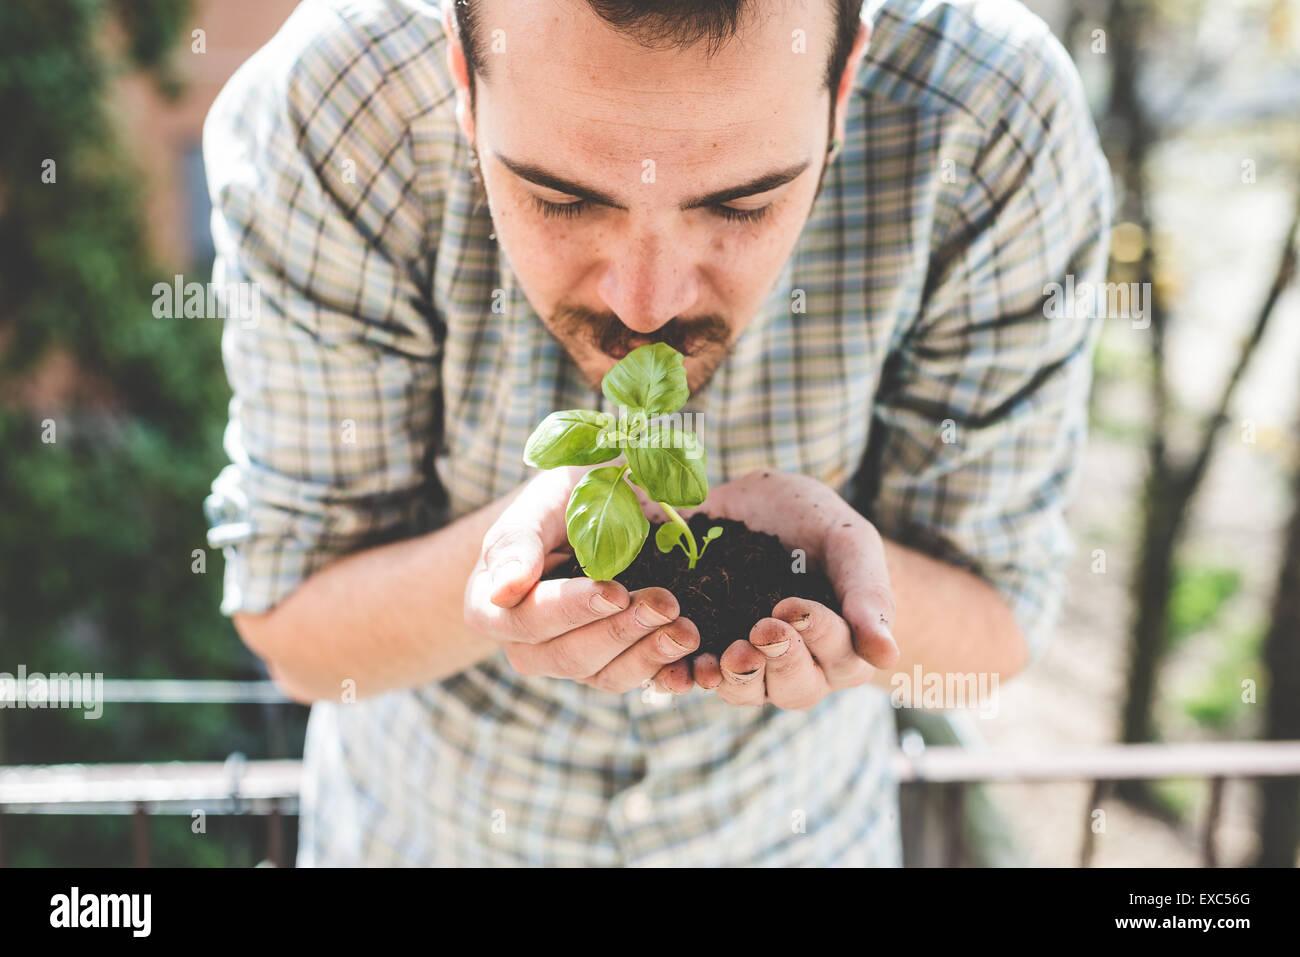 gardening stockfotos gardening bilder alamy. Black Bedroom Furniture Sets. Home Design Ideas